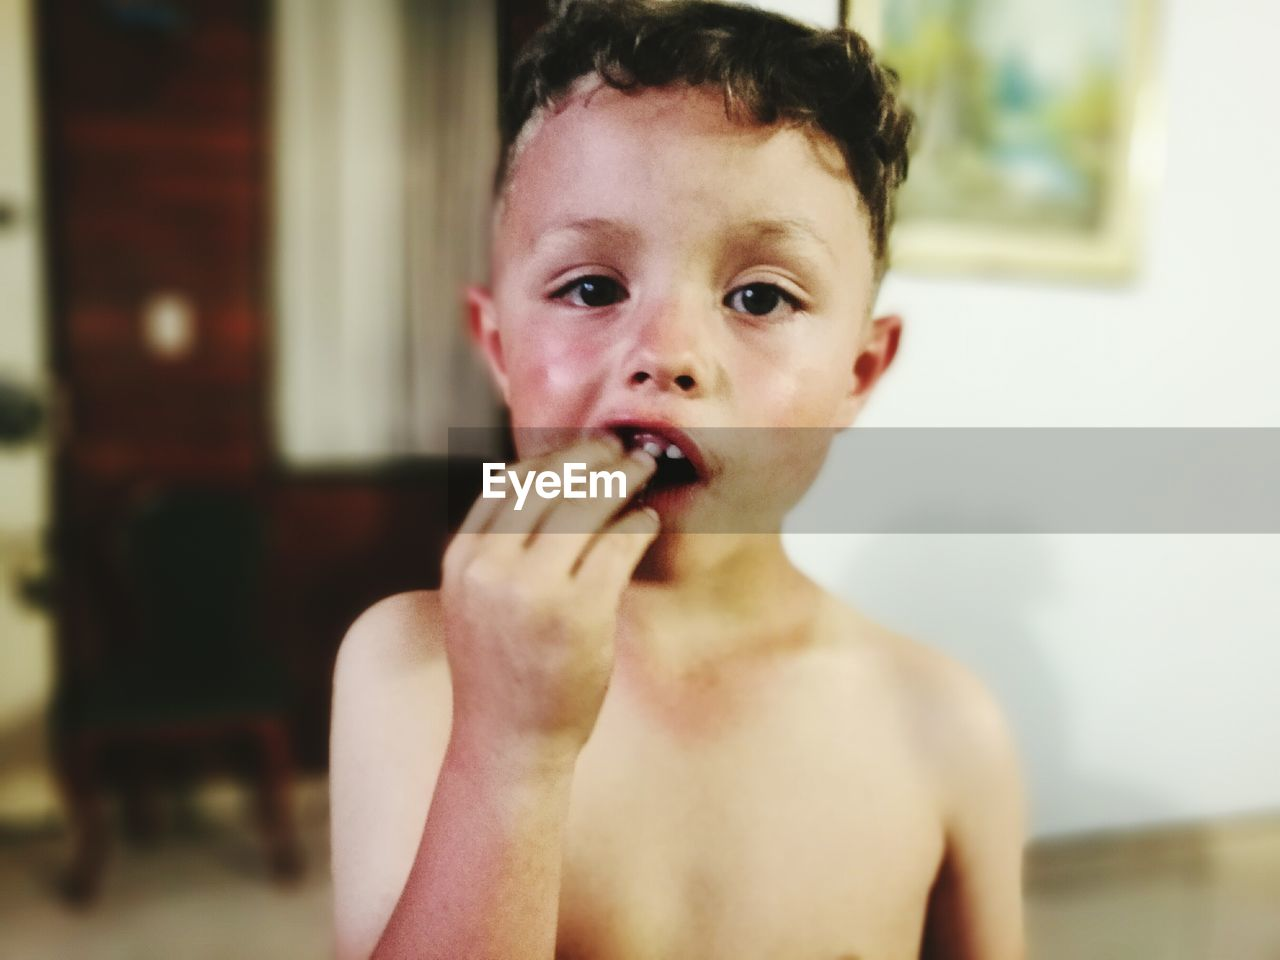 Close-up portrait of boy eating